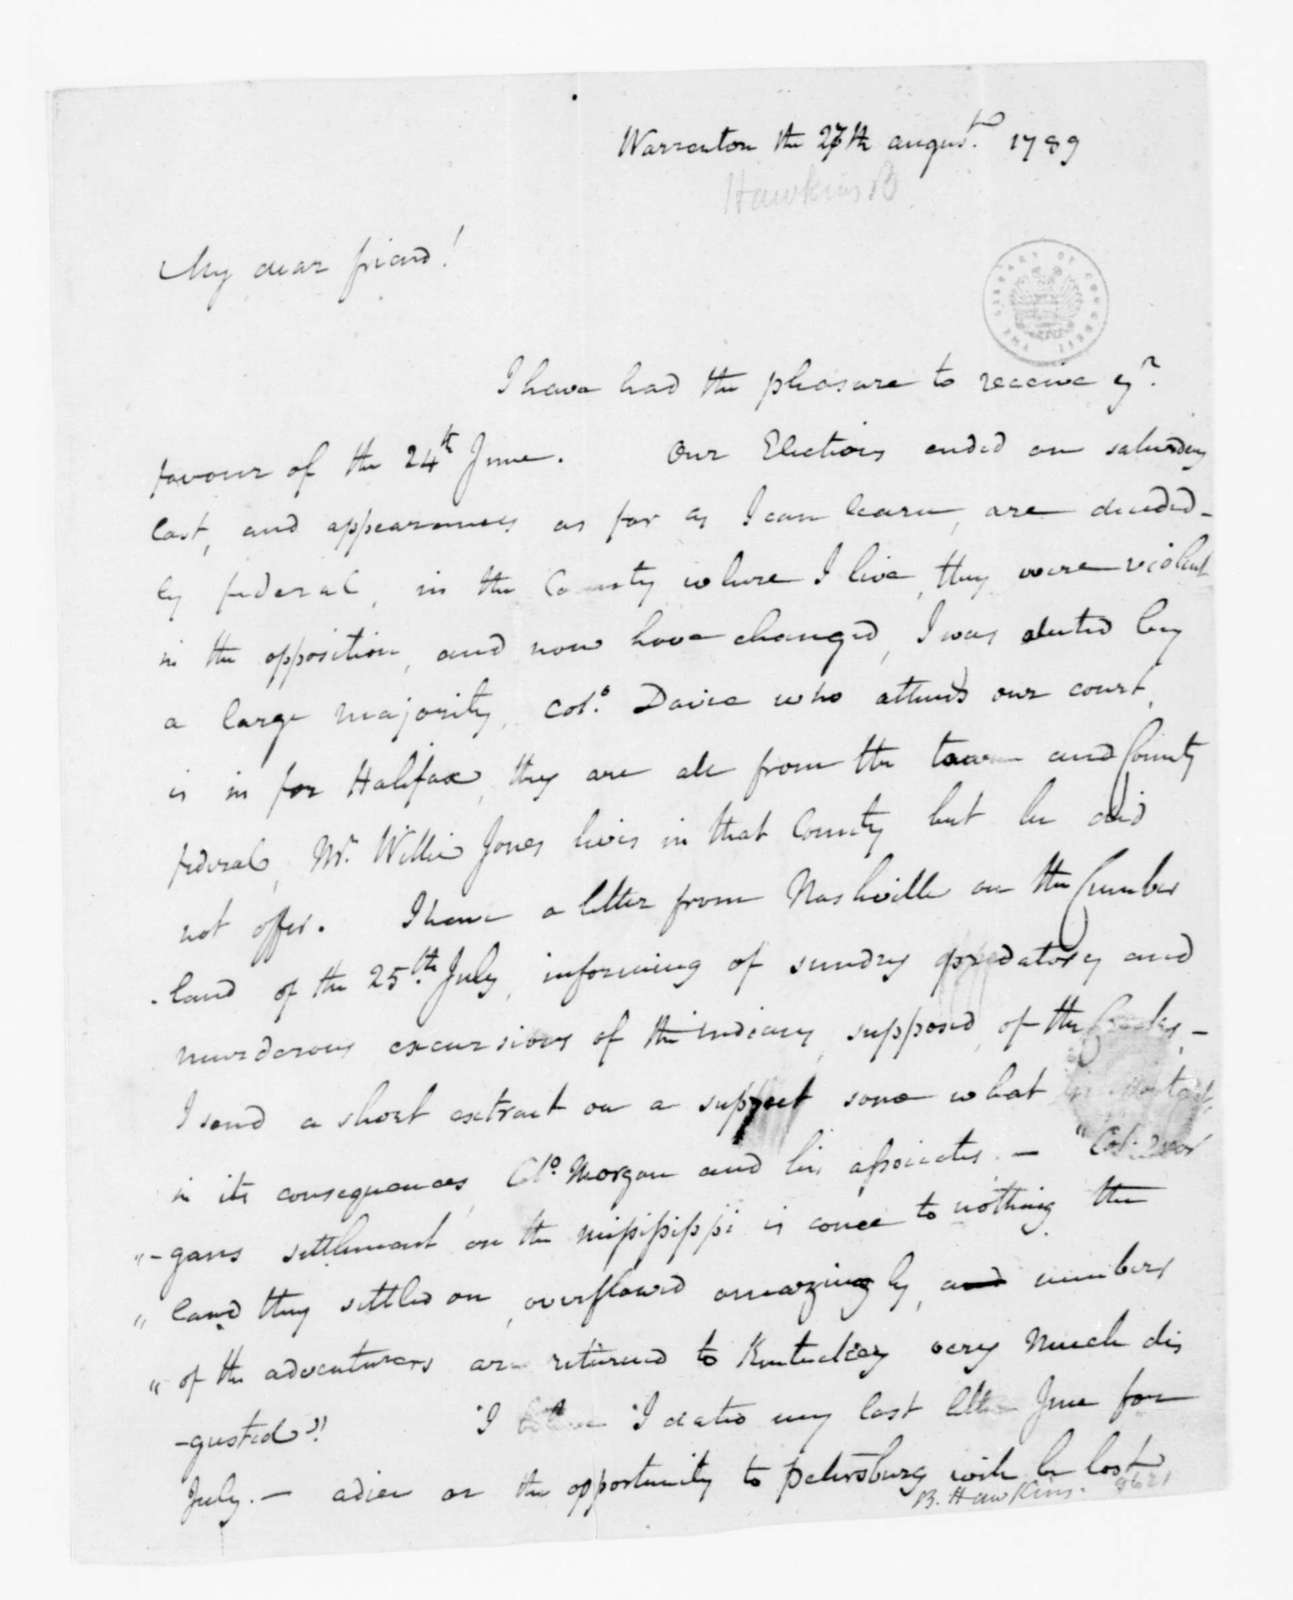 Benjamin Hawkins to James Madison, August 27, 1789.